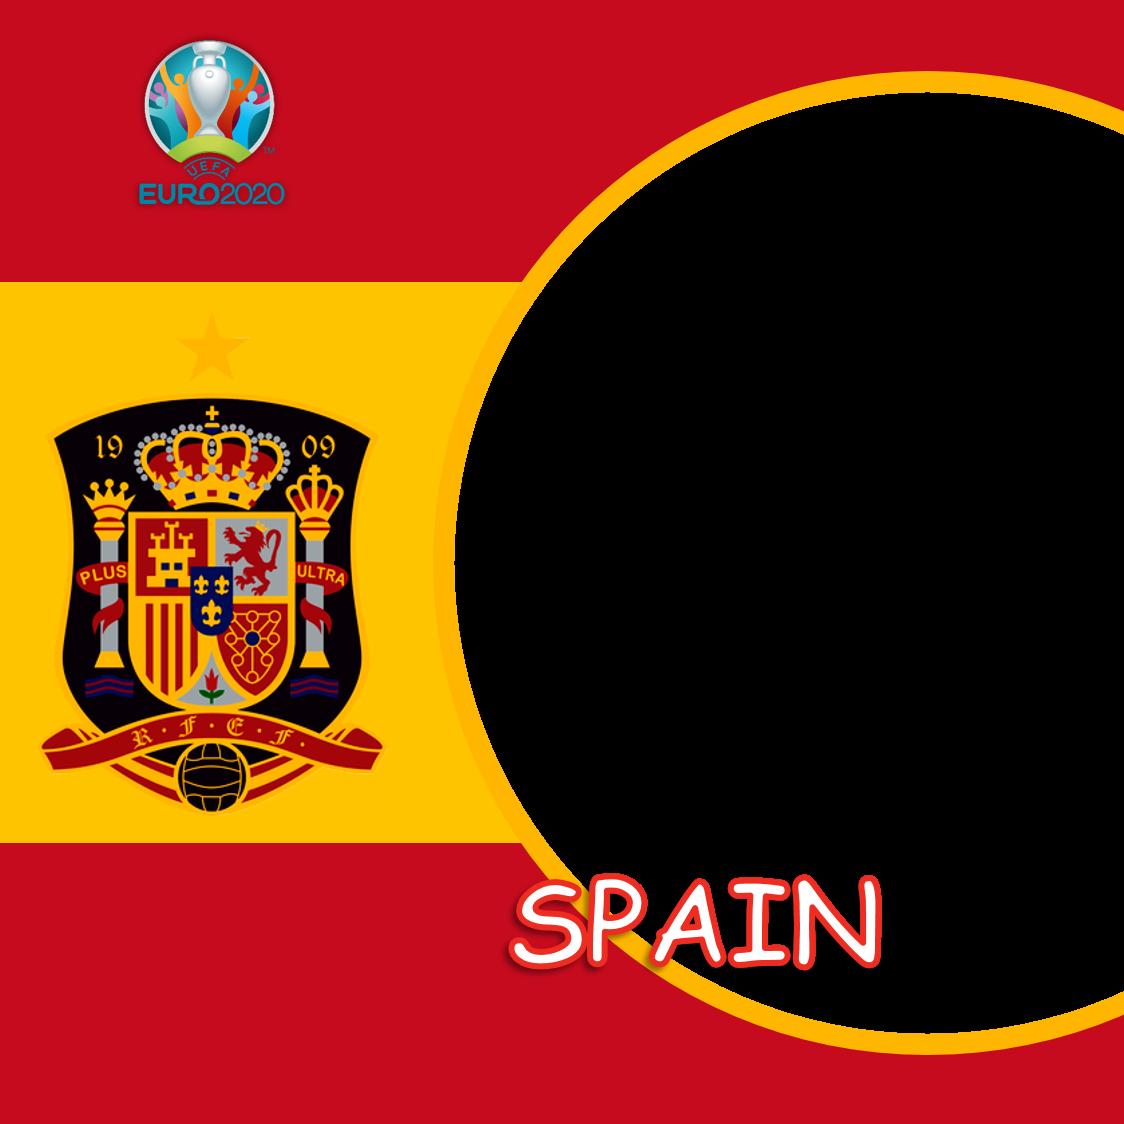 Template Background Bingkai Twibbon Spanyol Euro 2020 - Spain Euro 2021